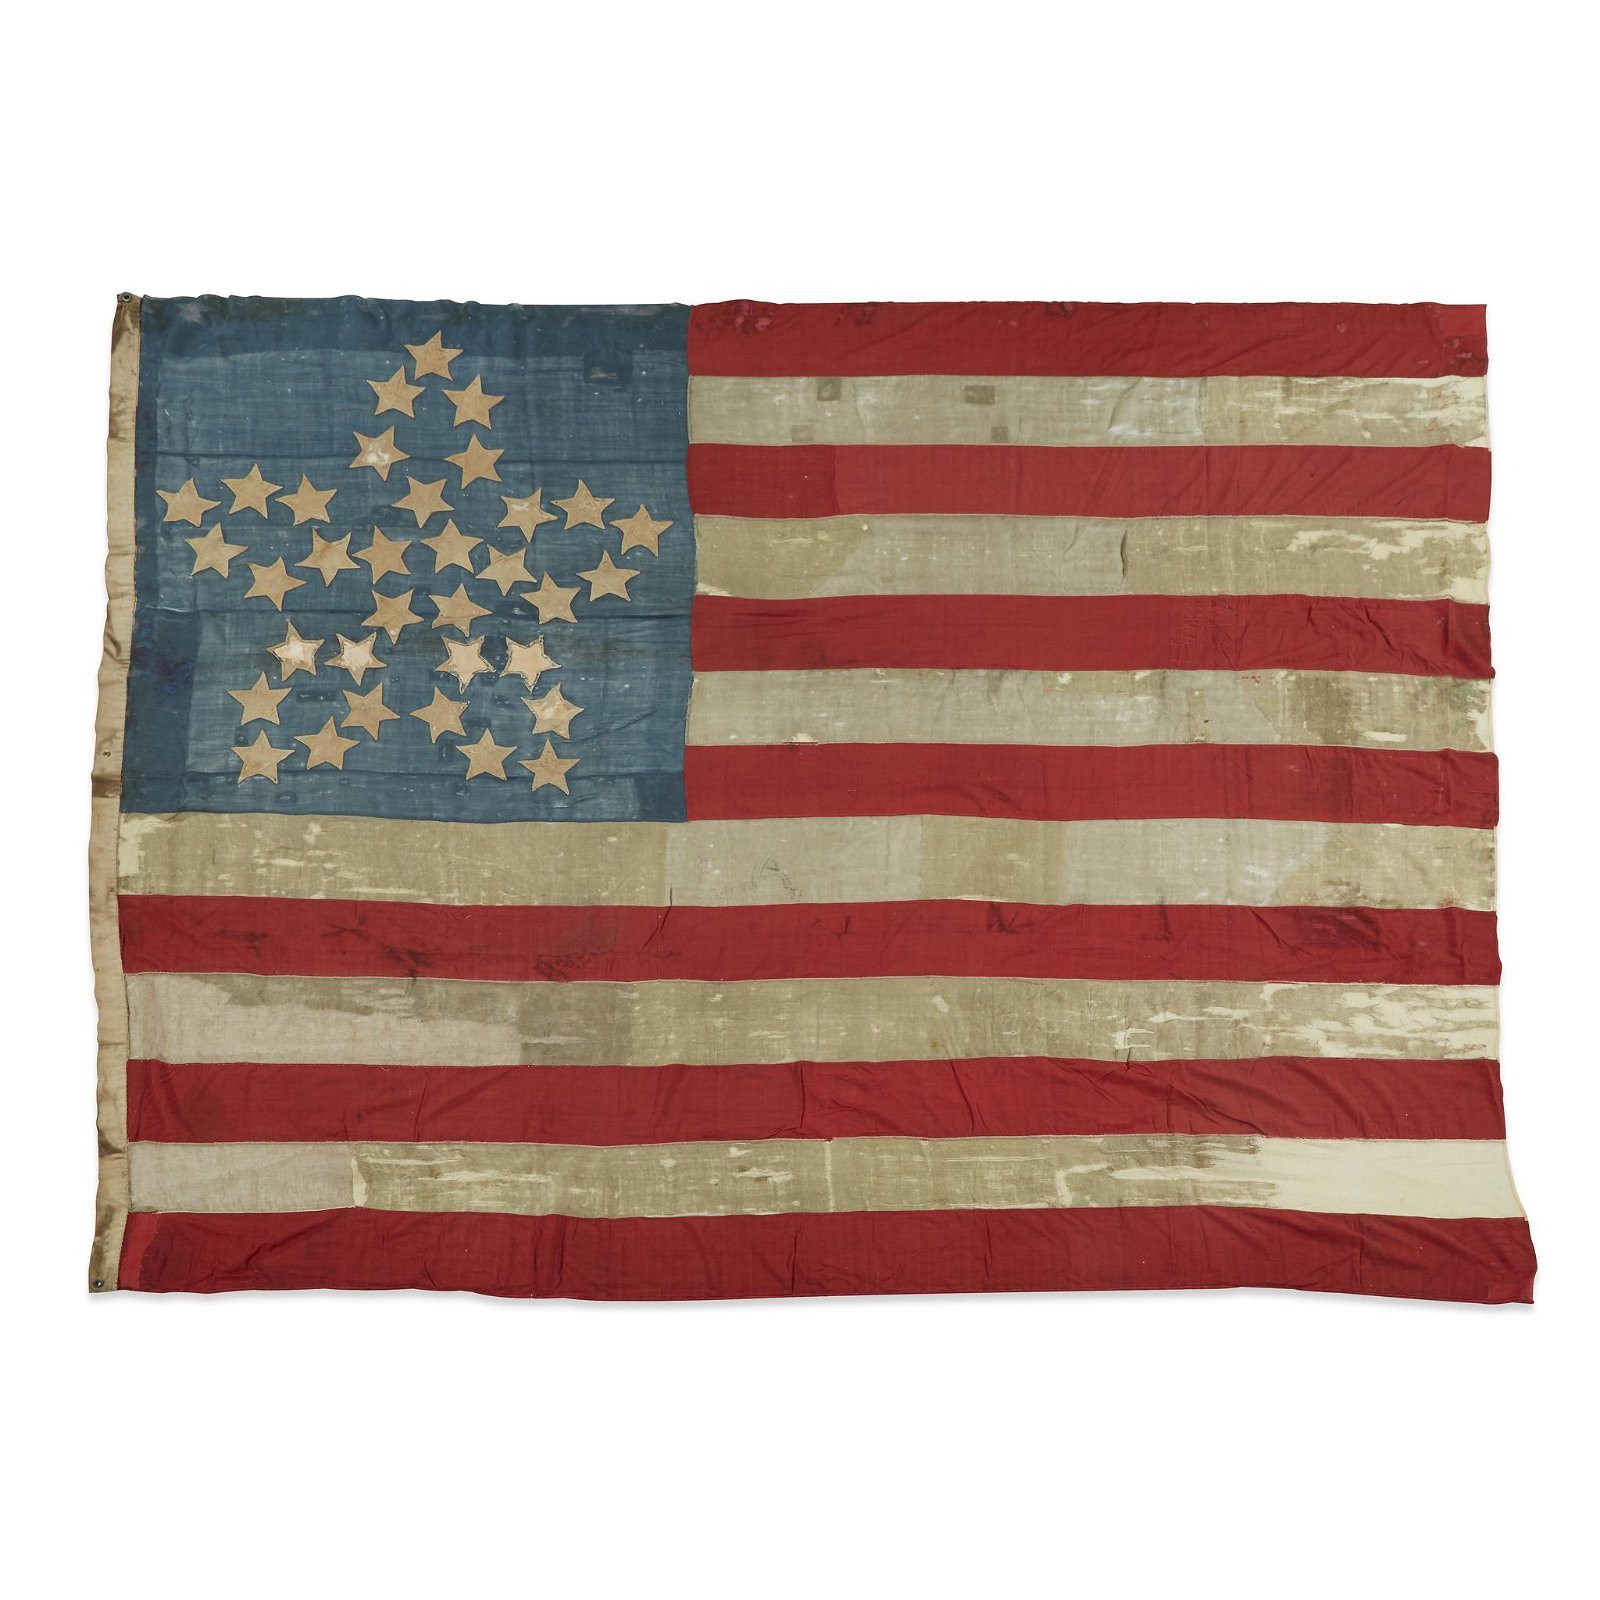 A 34-Star Great Flower American Flag